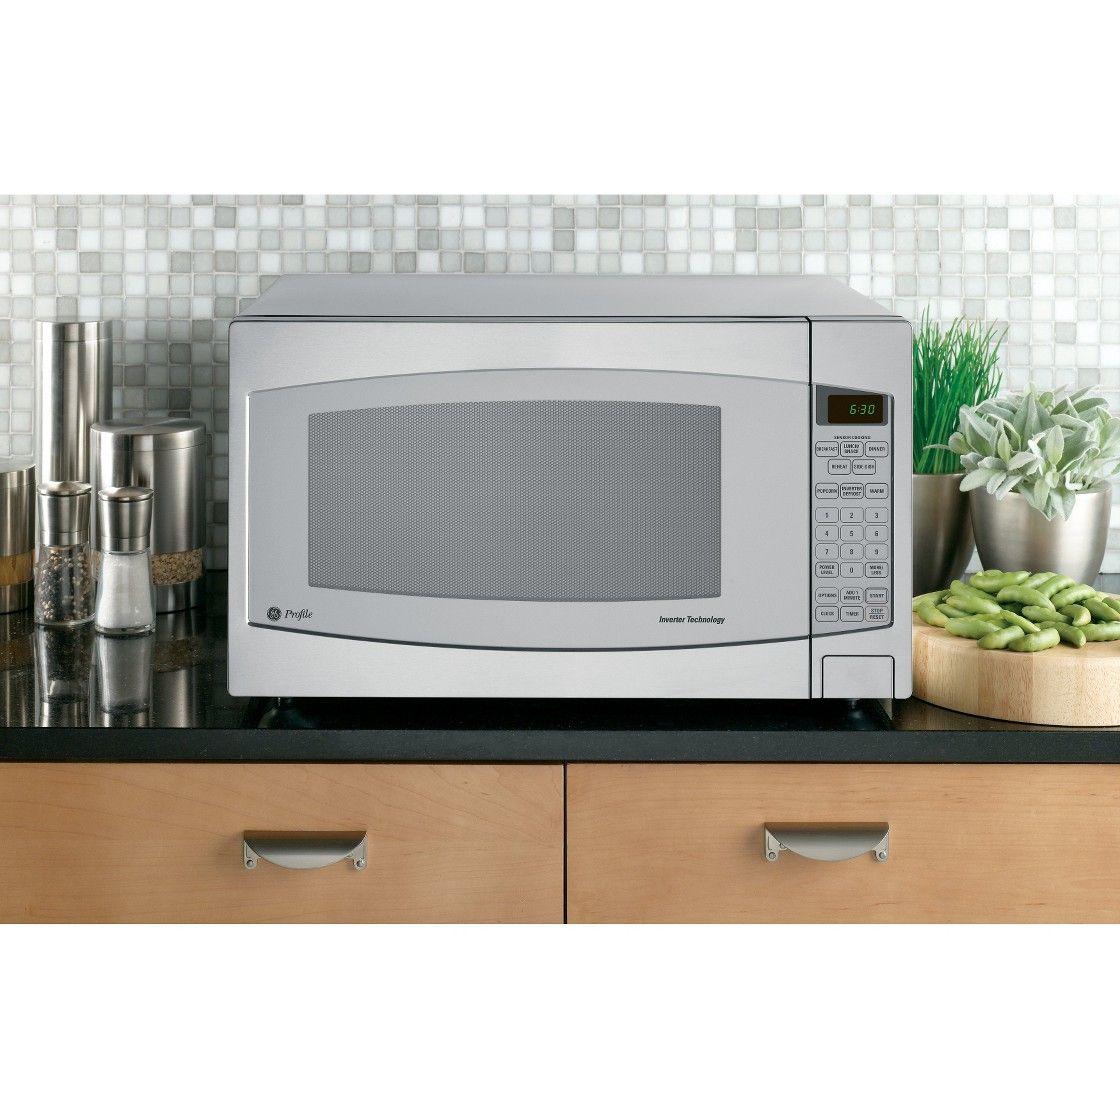 Ge Stainless Steel Profile 2 2 Cu Ft Microwave Stainless Steel Oven Microwave Oven Microwave